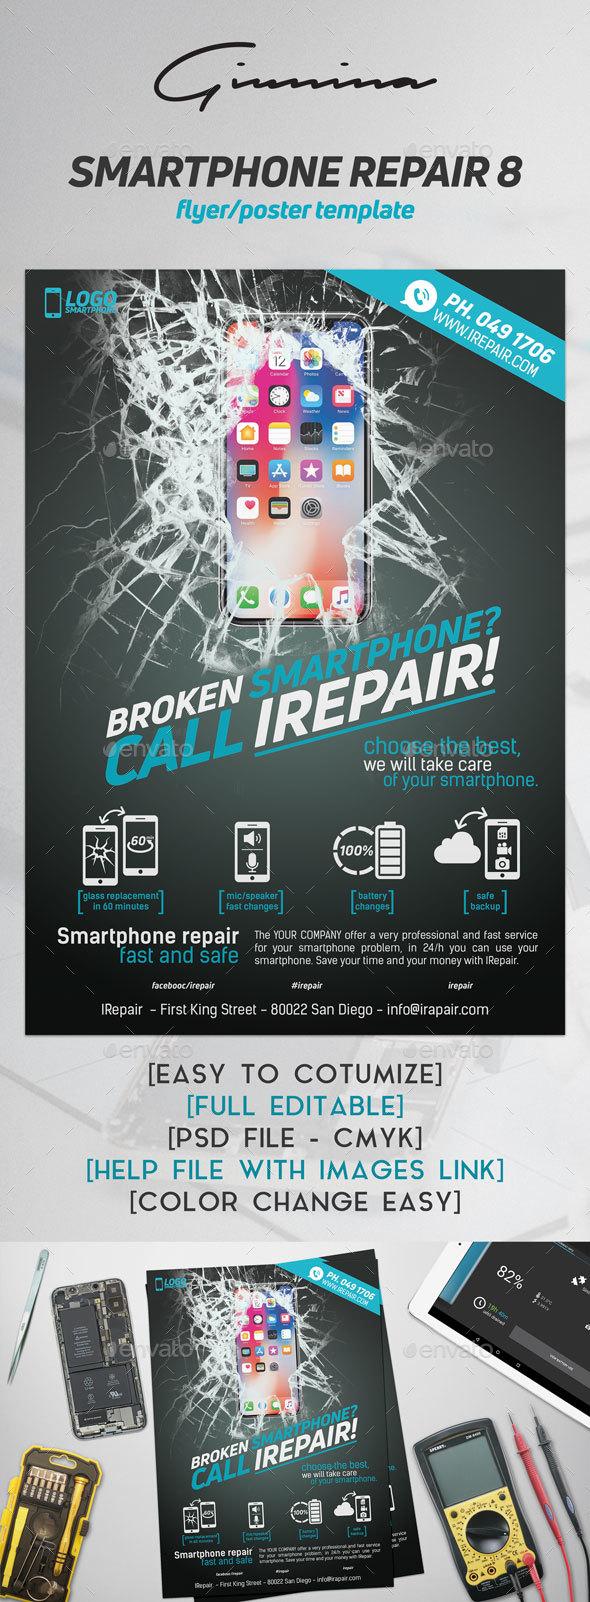 Smartphone Repair 9 Flyer/Poster - Commerce Flyers